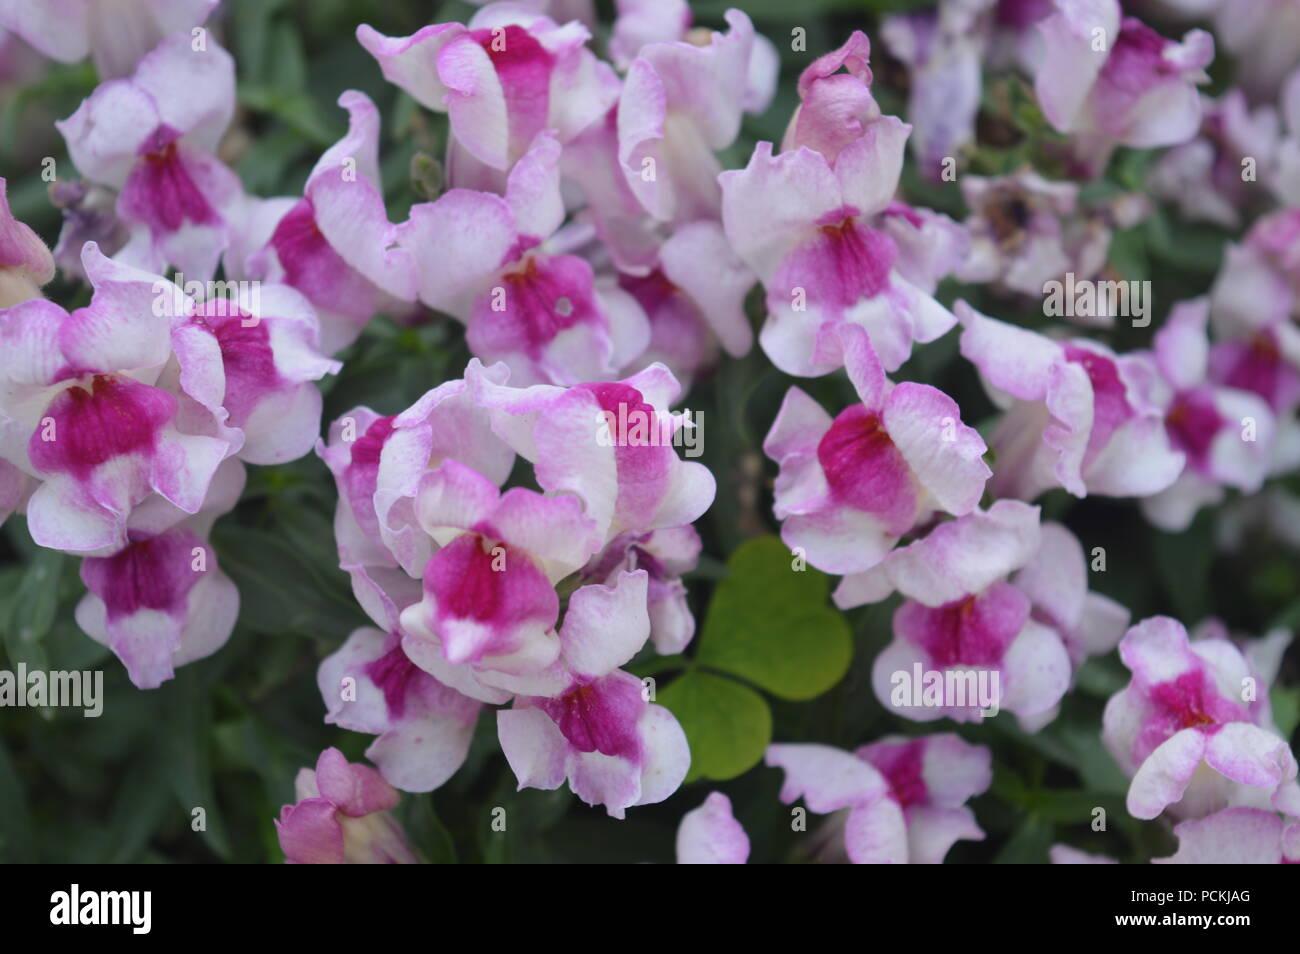 Dragon Flowers In A Garden Stock Photo 214331784 Alamy